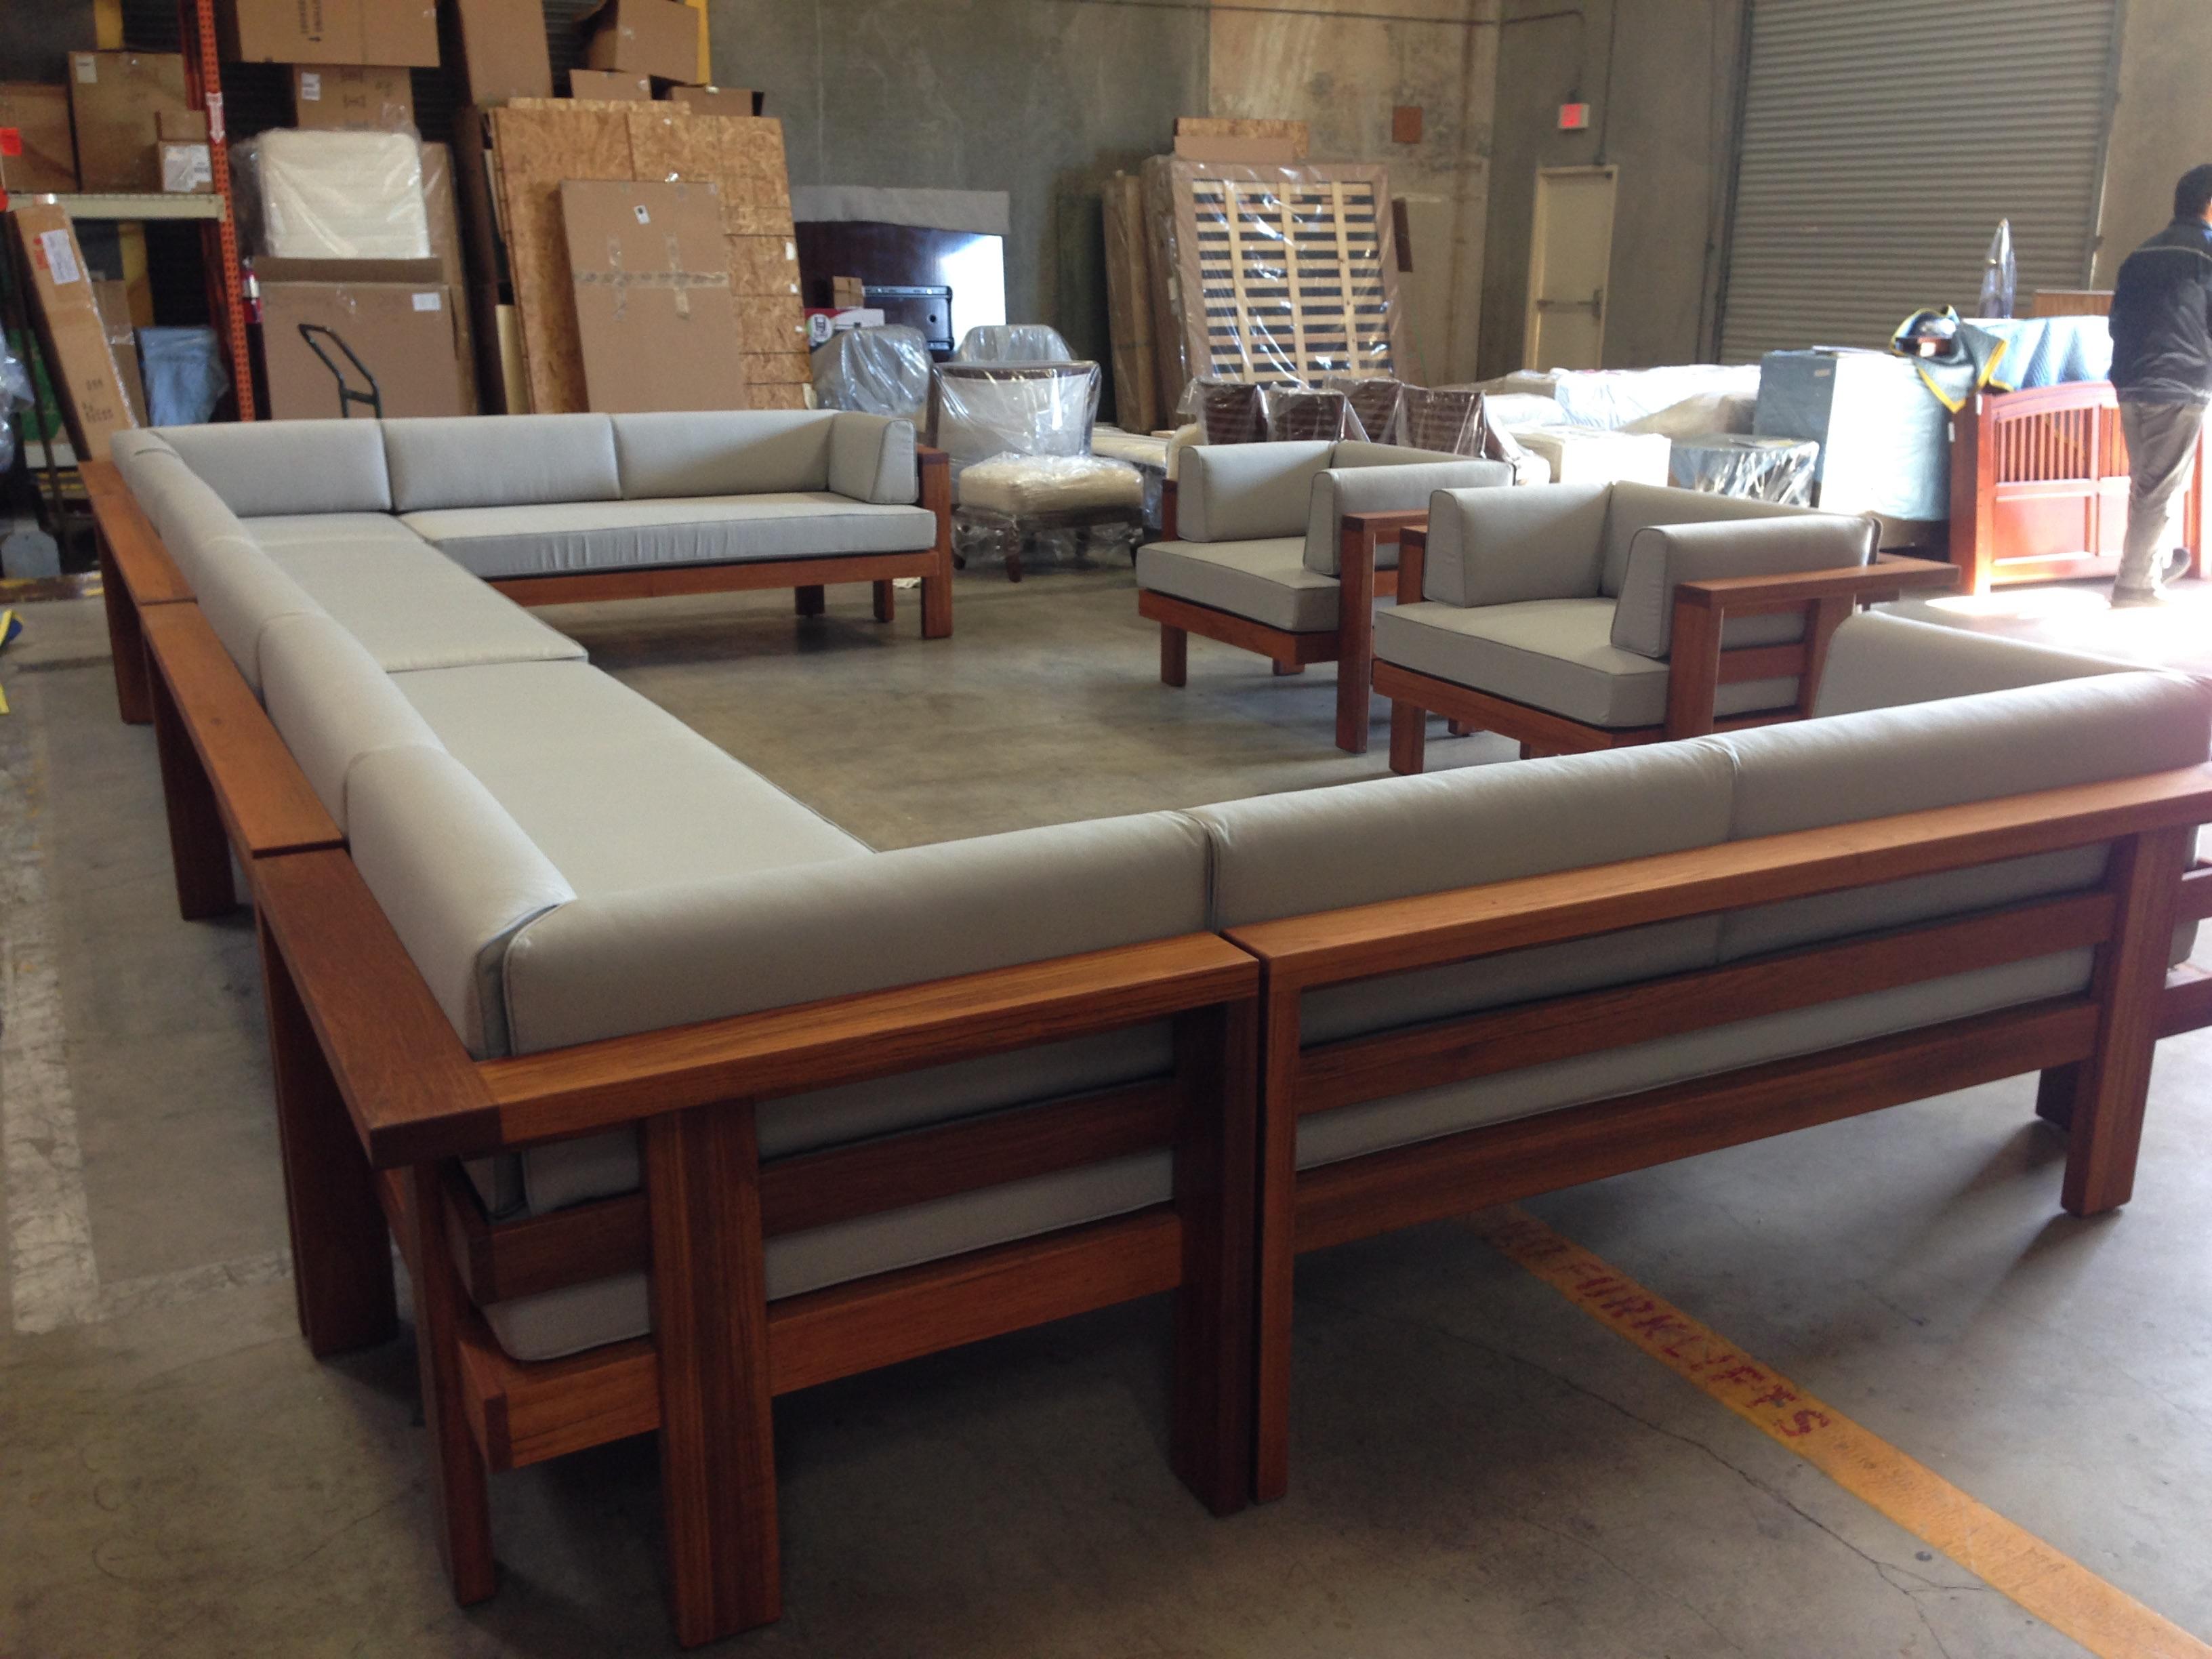 teak furniture img_0708 img_0070 ... TEZLQZZ